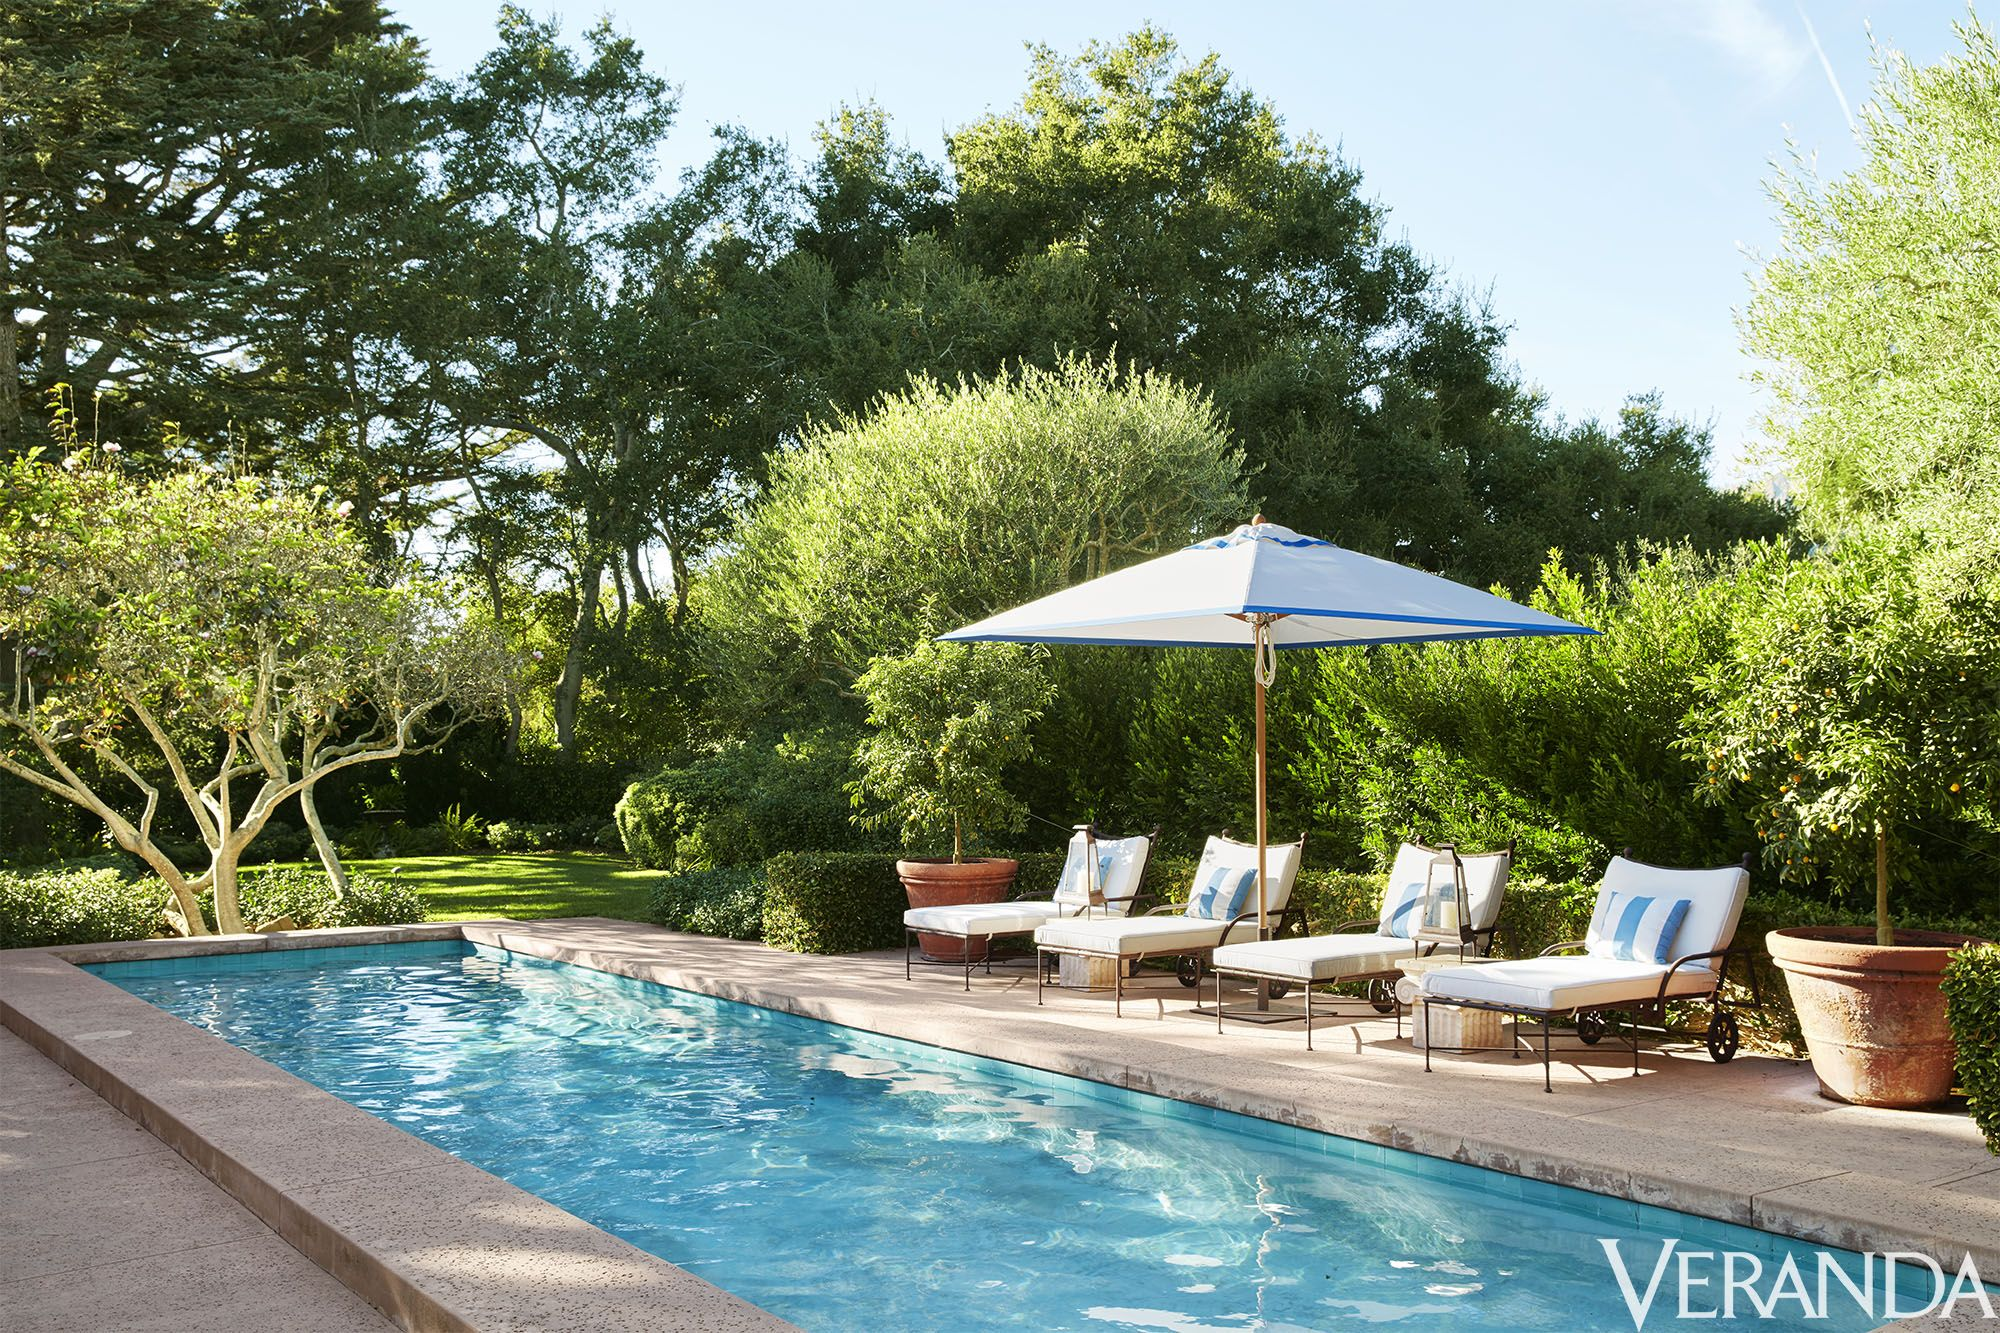 30 gorgeous summer house ideas best ways to decorate summer